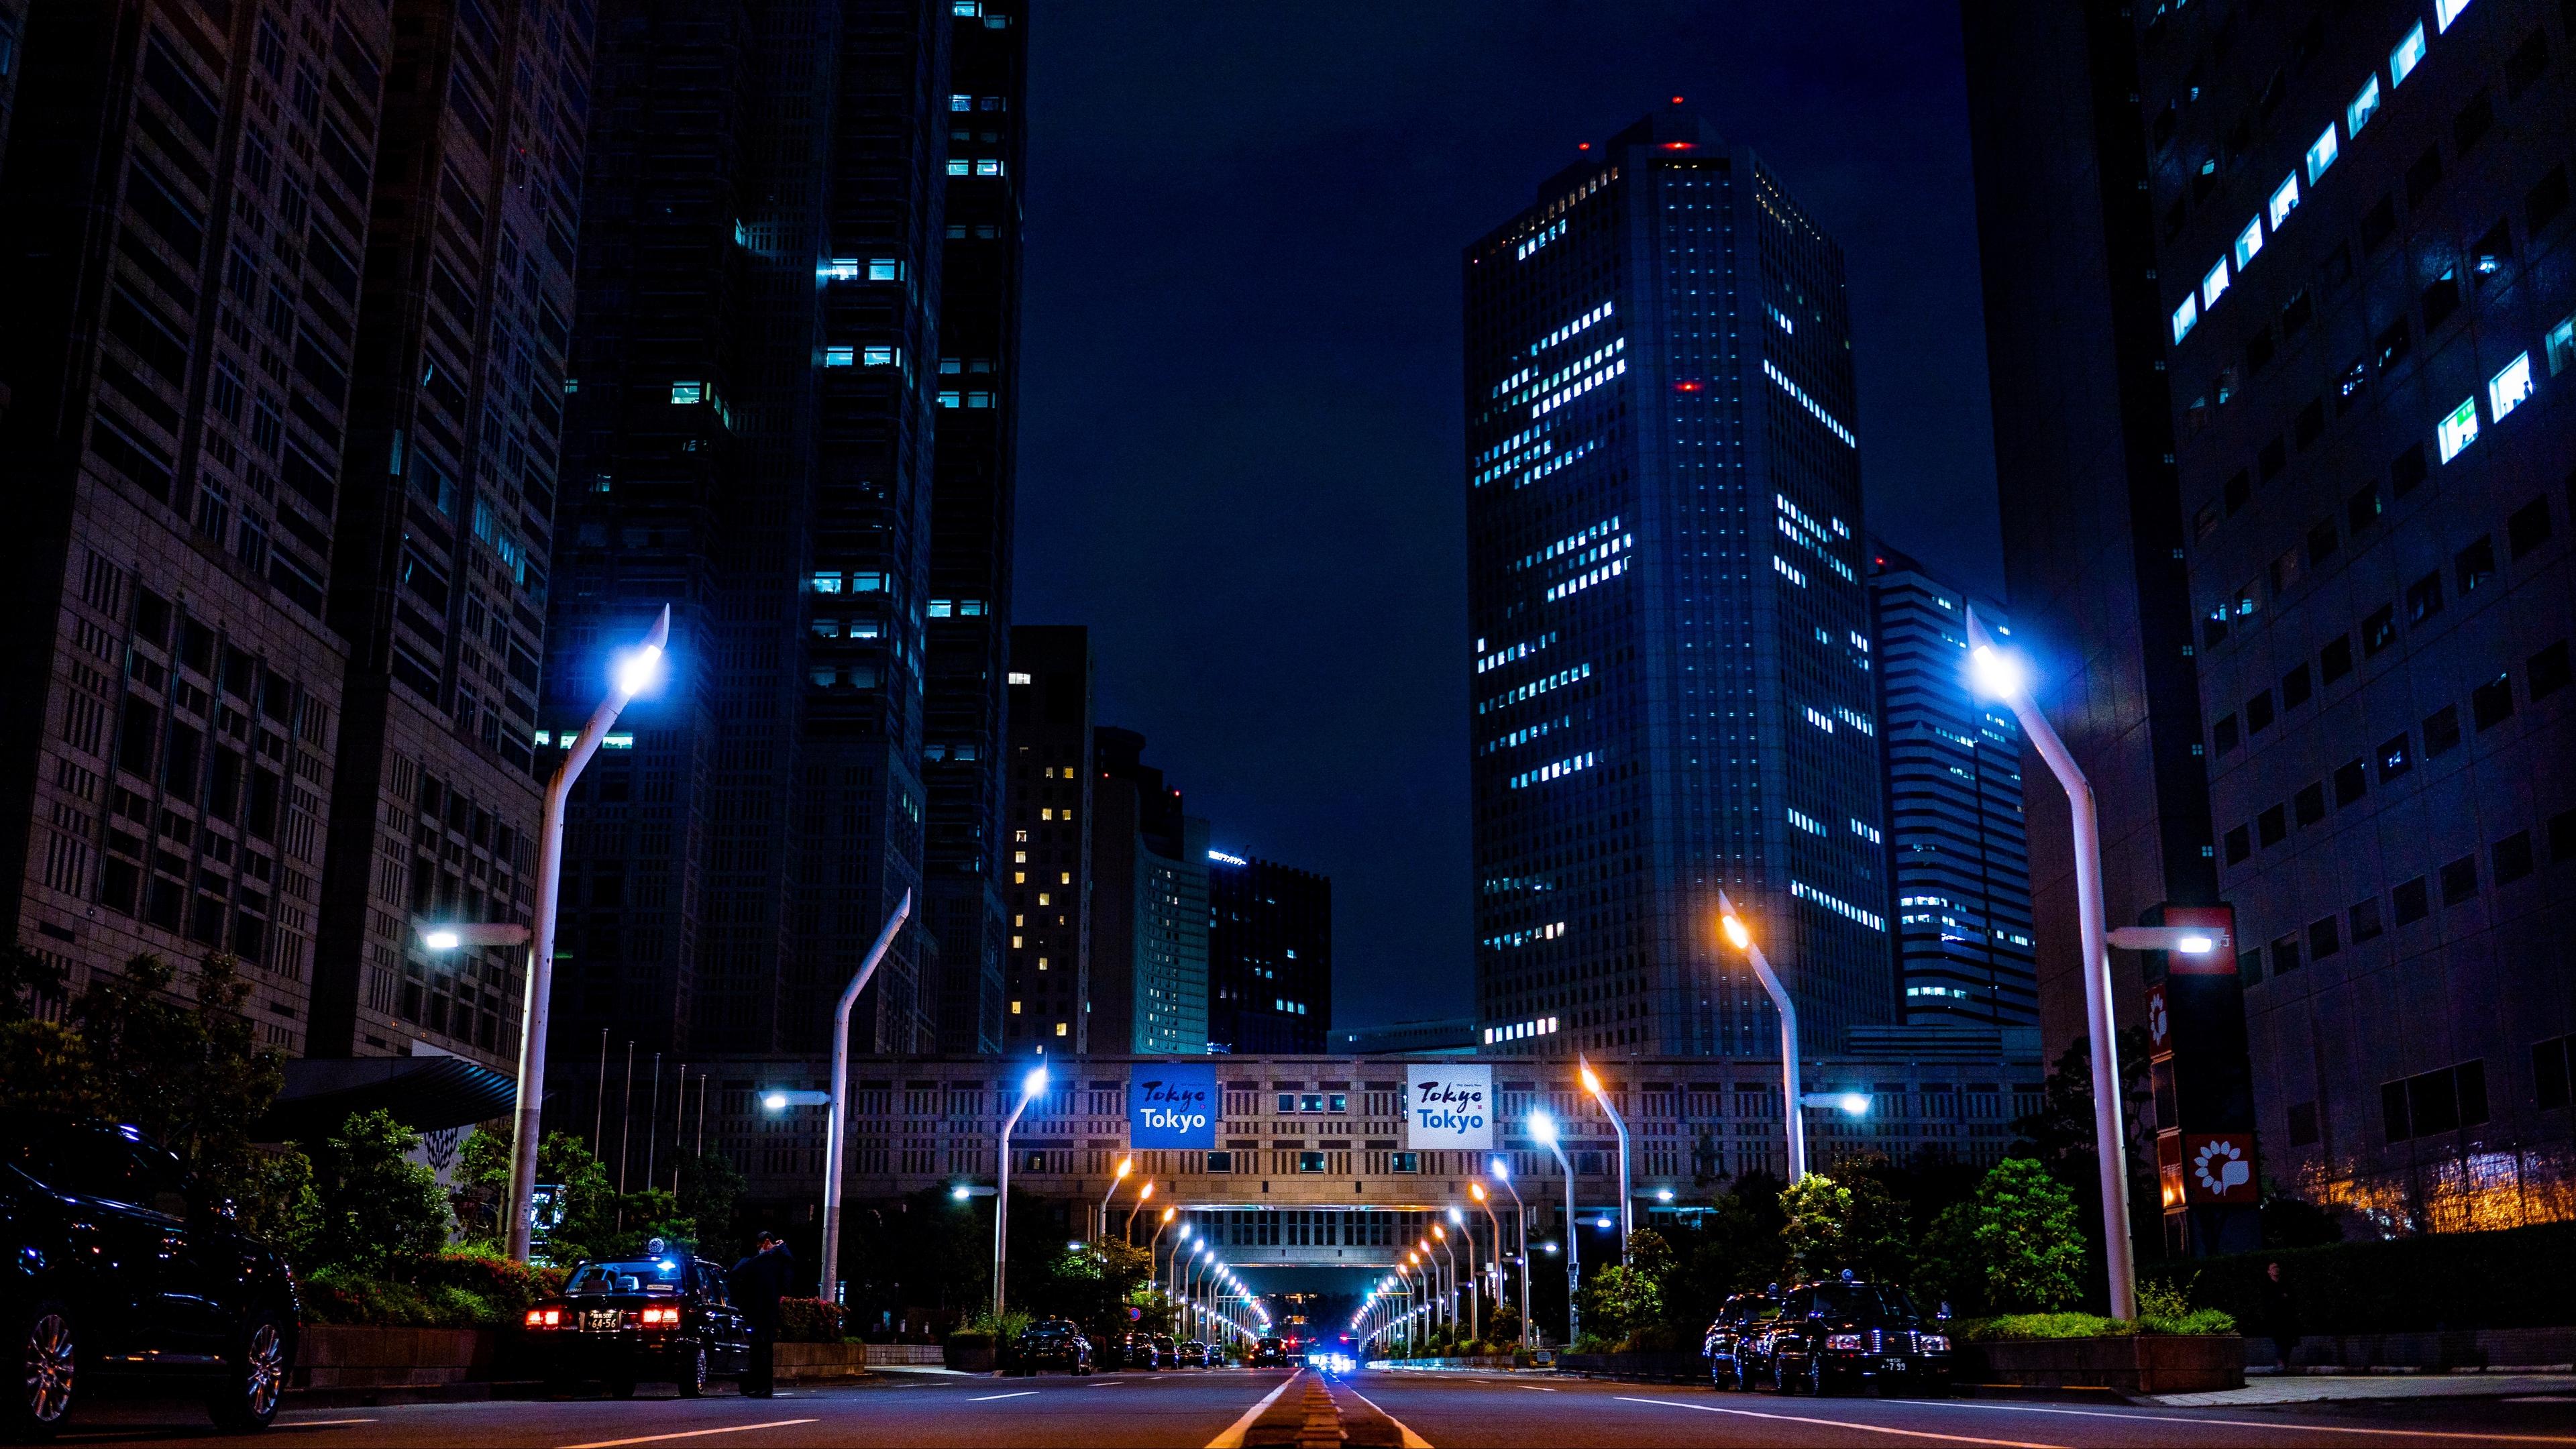 night city skyscrapers city lights bridge 4k 1538067945 - night city, skyscrapers, city lights, bridge 4k - Skyscrapers, night city, city lights